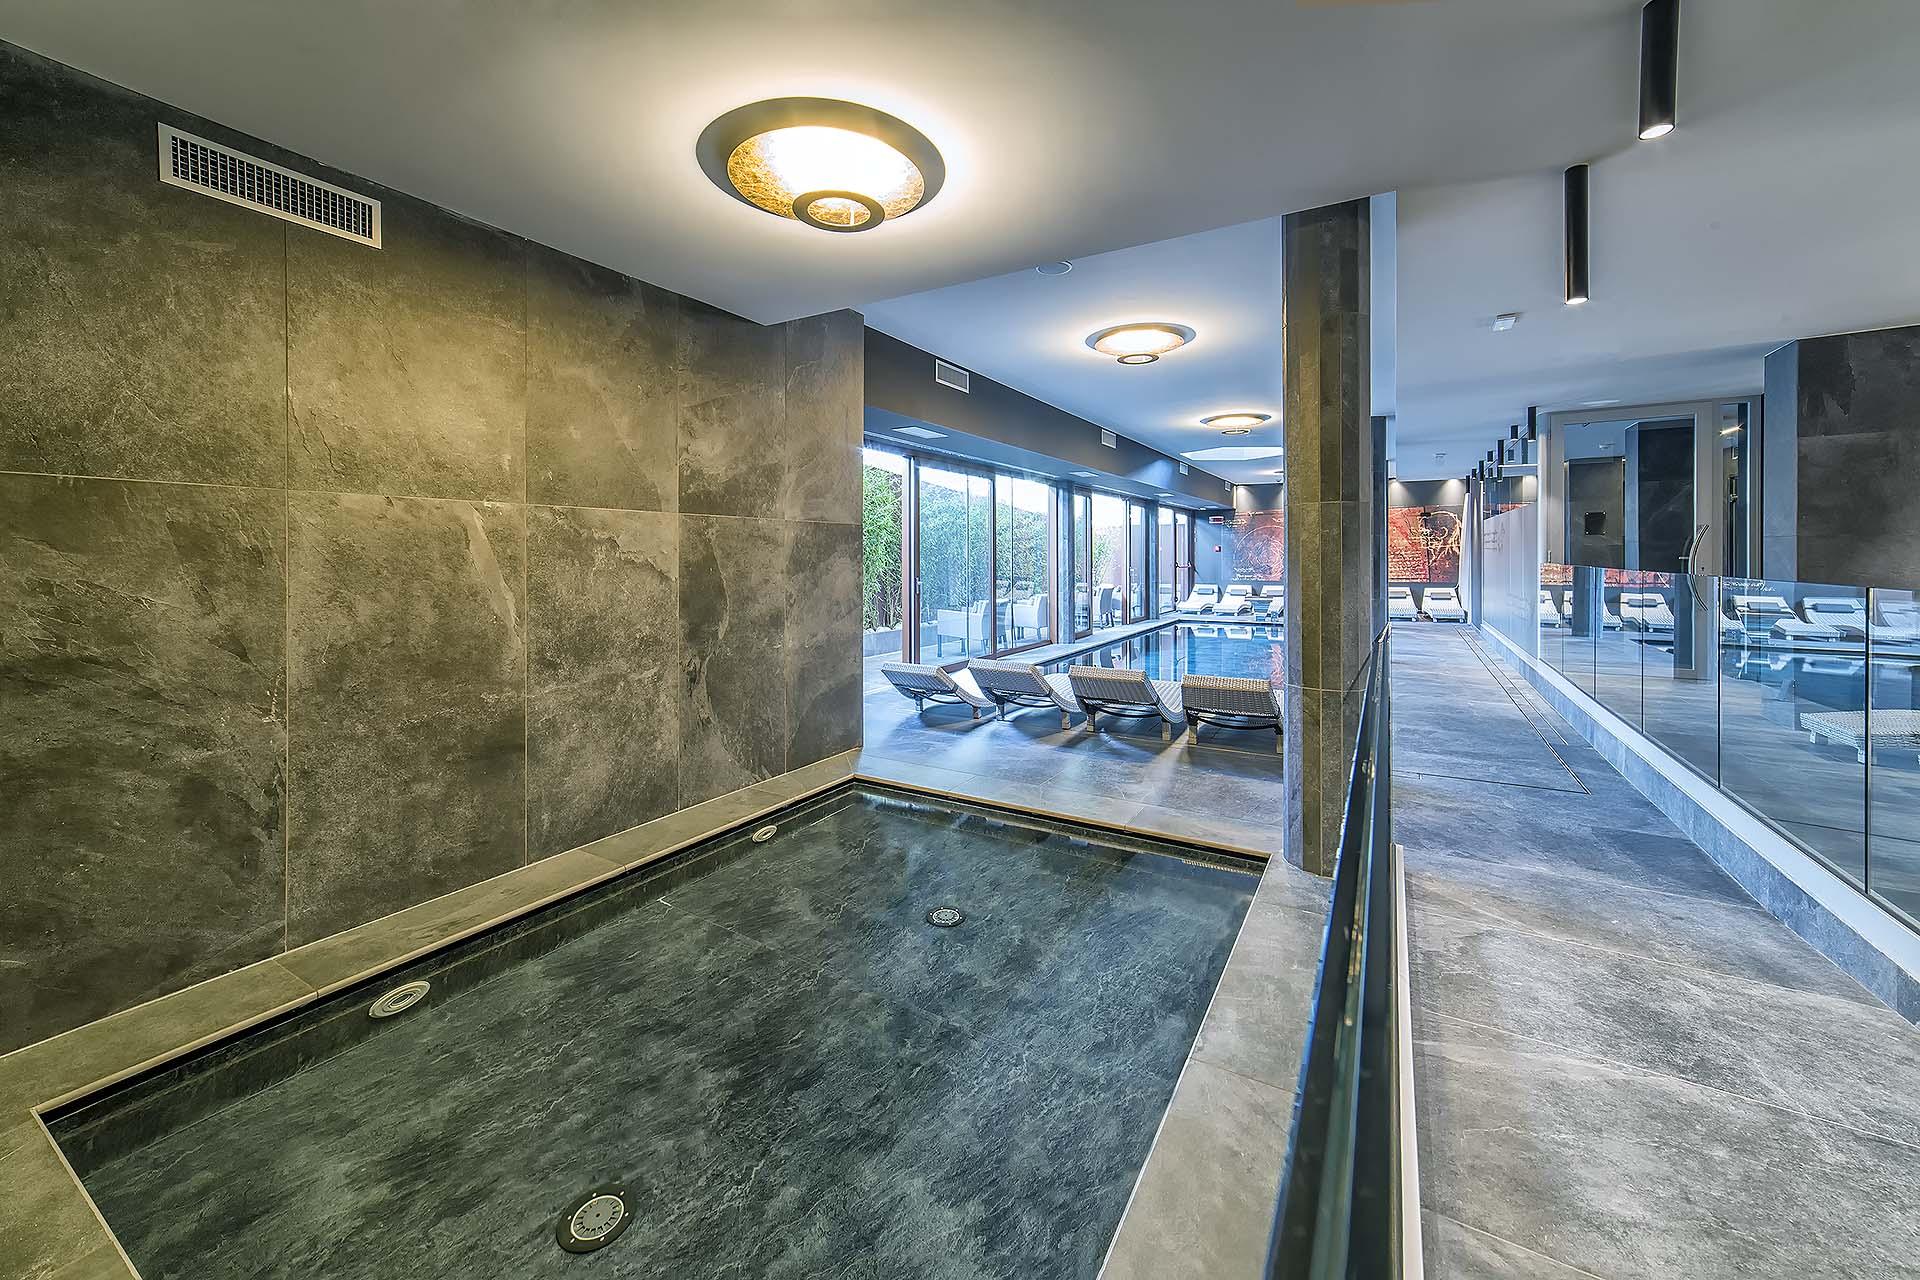 PISCINA ADULTI <br> HOTEL LEONARDO DA VINCI - BIBIONE (VE)